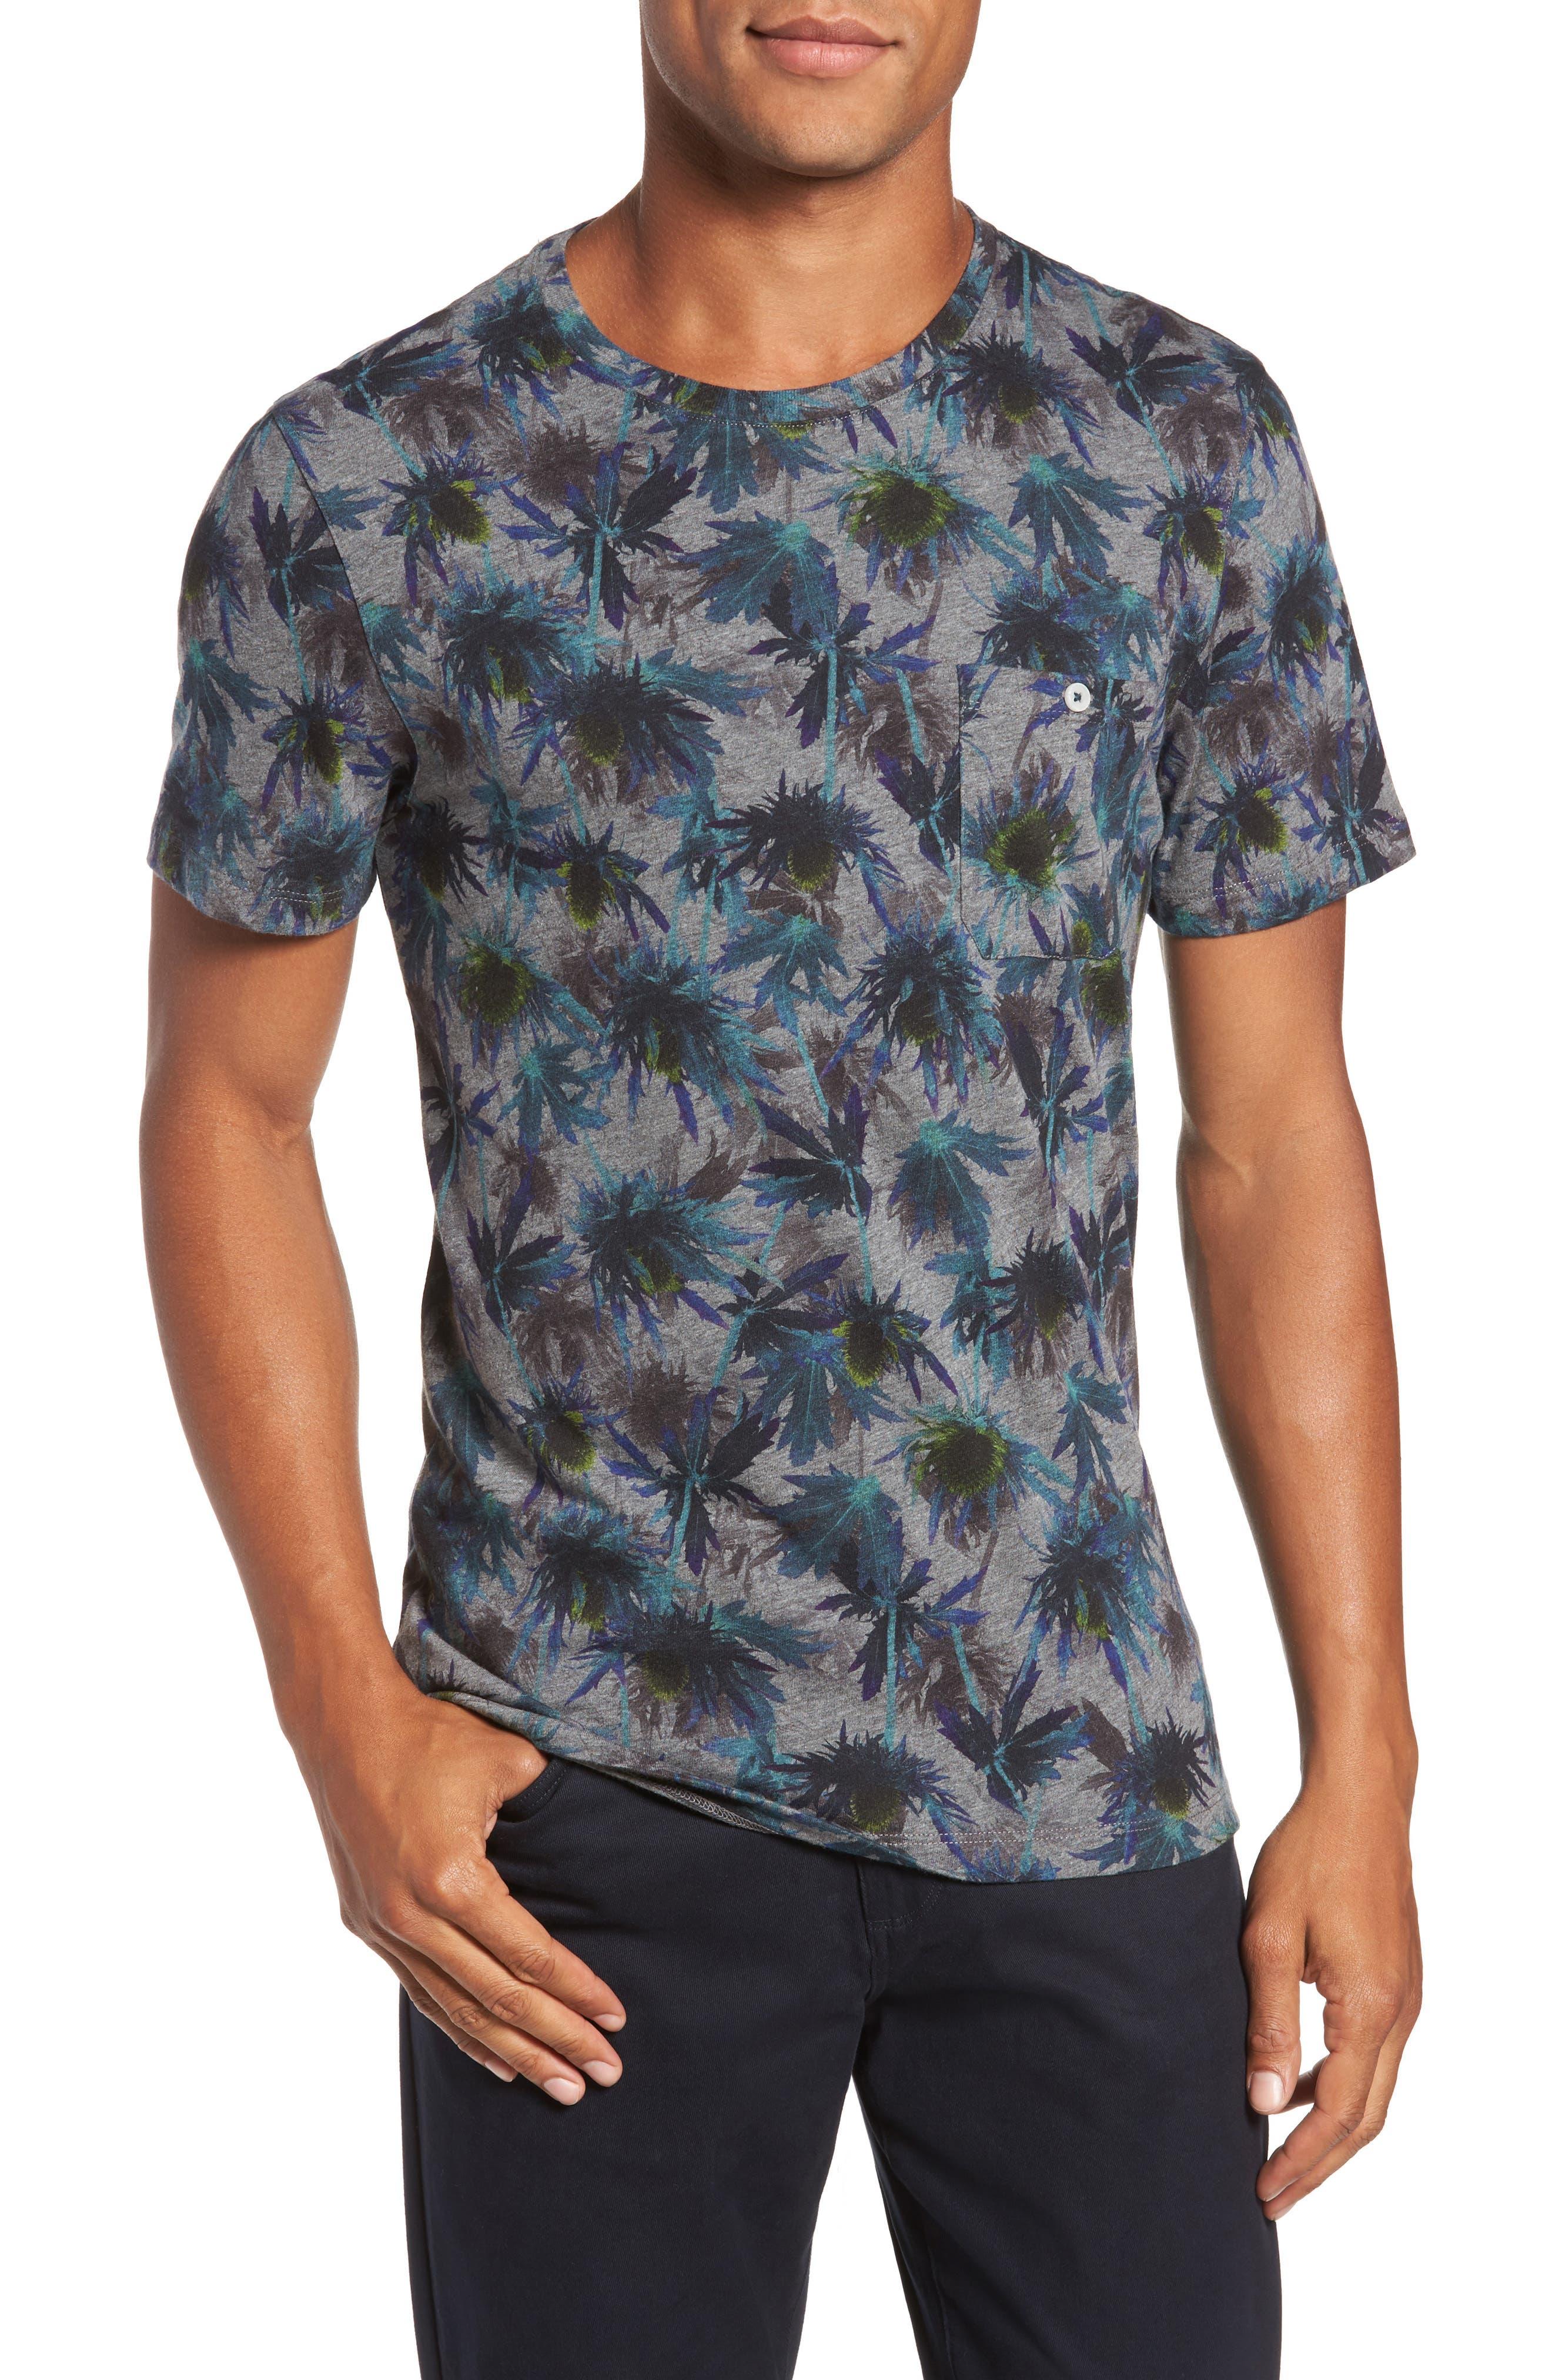 Katatak Thistle Print T-Shirt,                             Main thumbnail 1, color,                             Grey